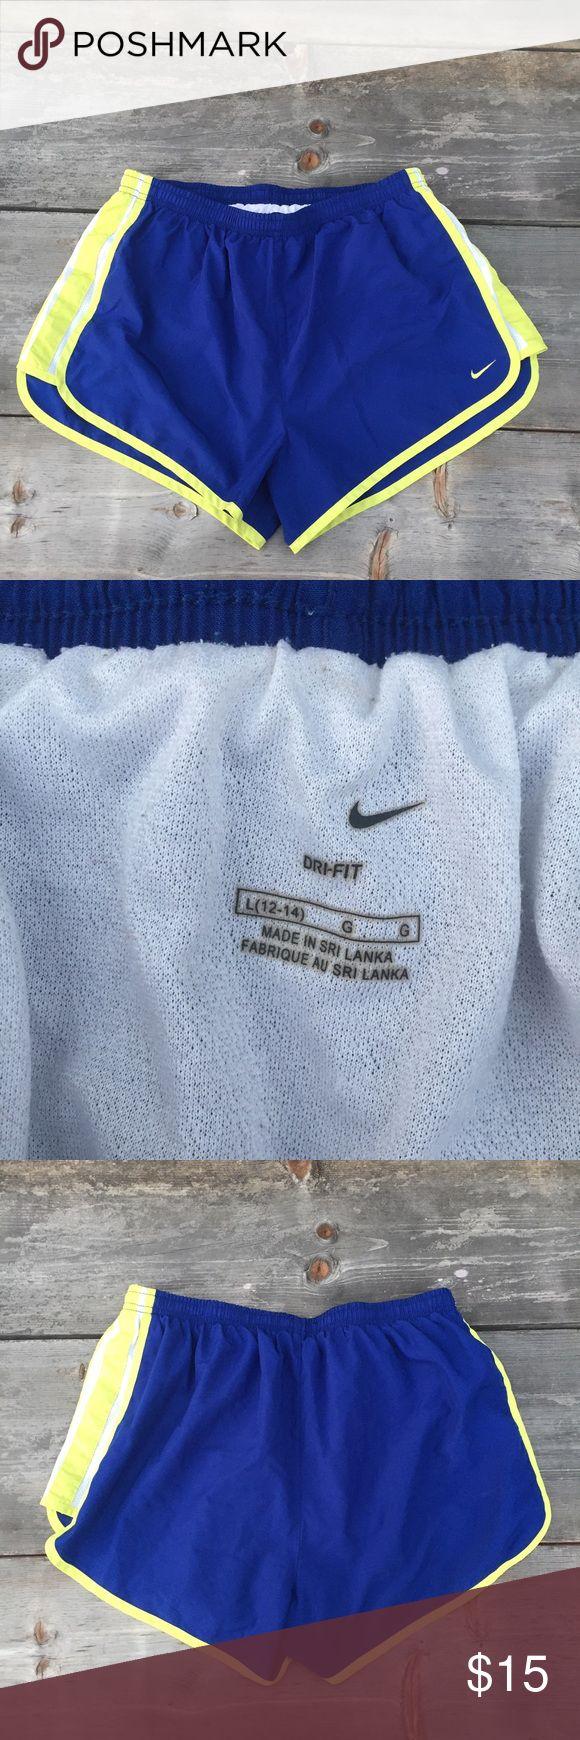 "NIKE RUNNING SHORTS SZ L BLUE DRI FIT NIKE RUNNING SHORTS SZ L BLUE DRI FIT- WAIST 14.5"" LINED Nike Shorts https://twitter.com/gmsingin1/status/915364876633042945"